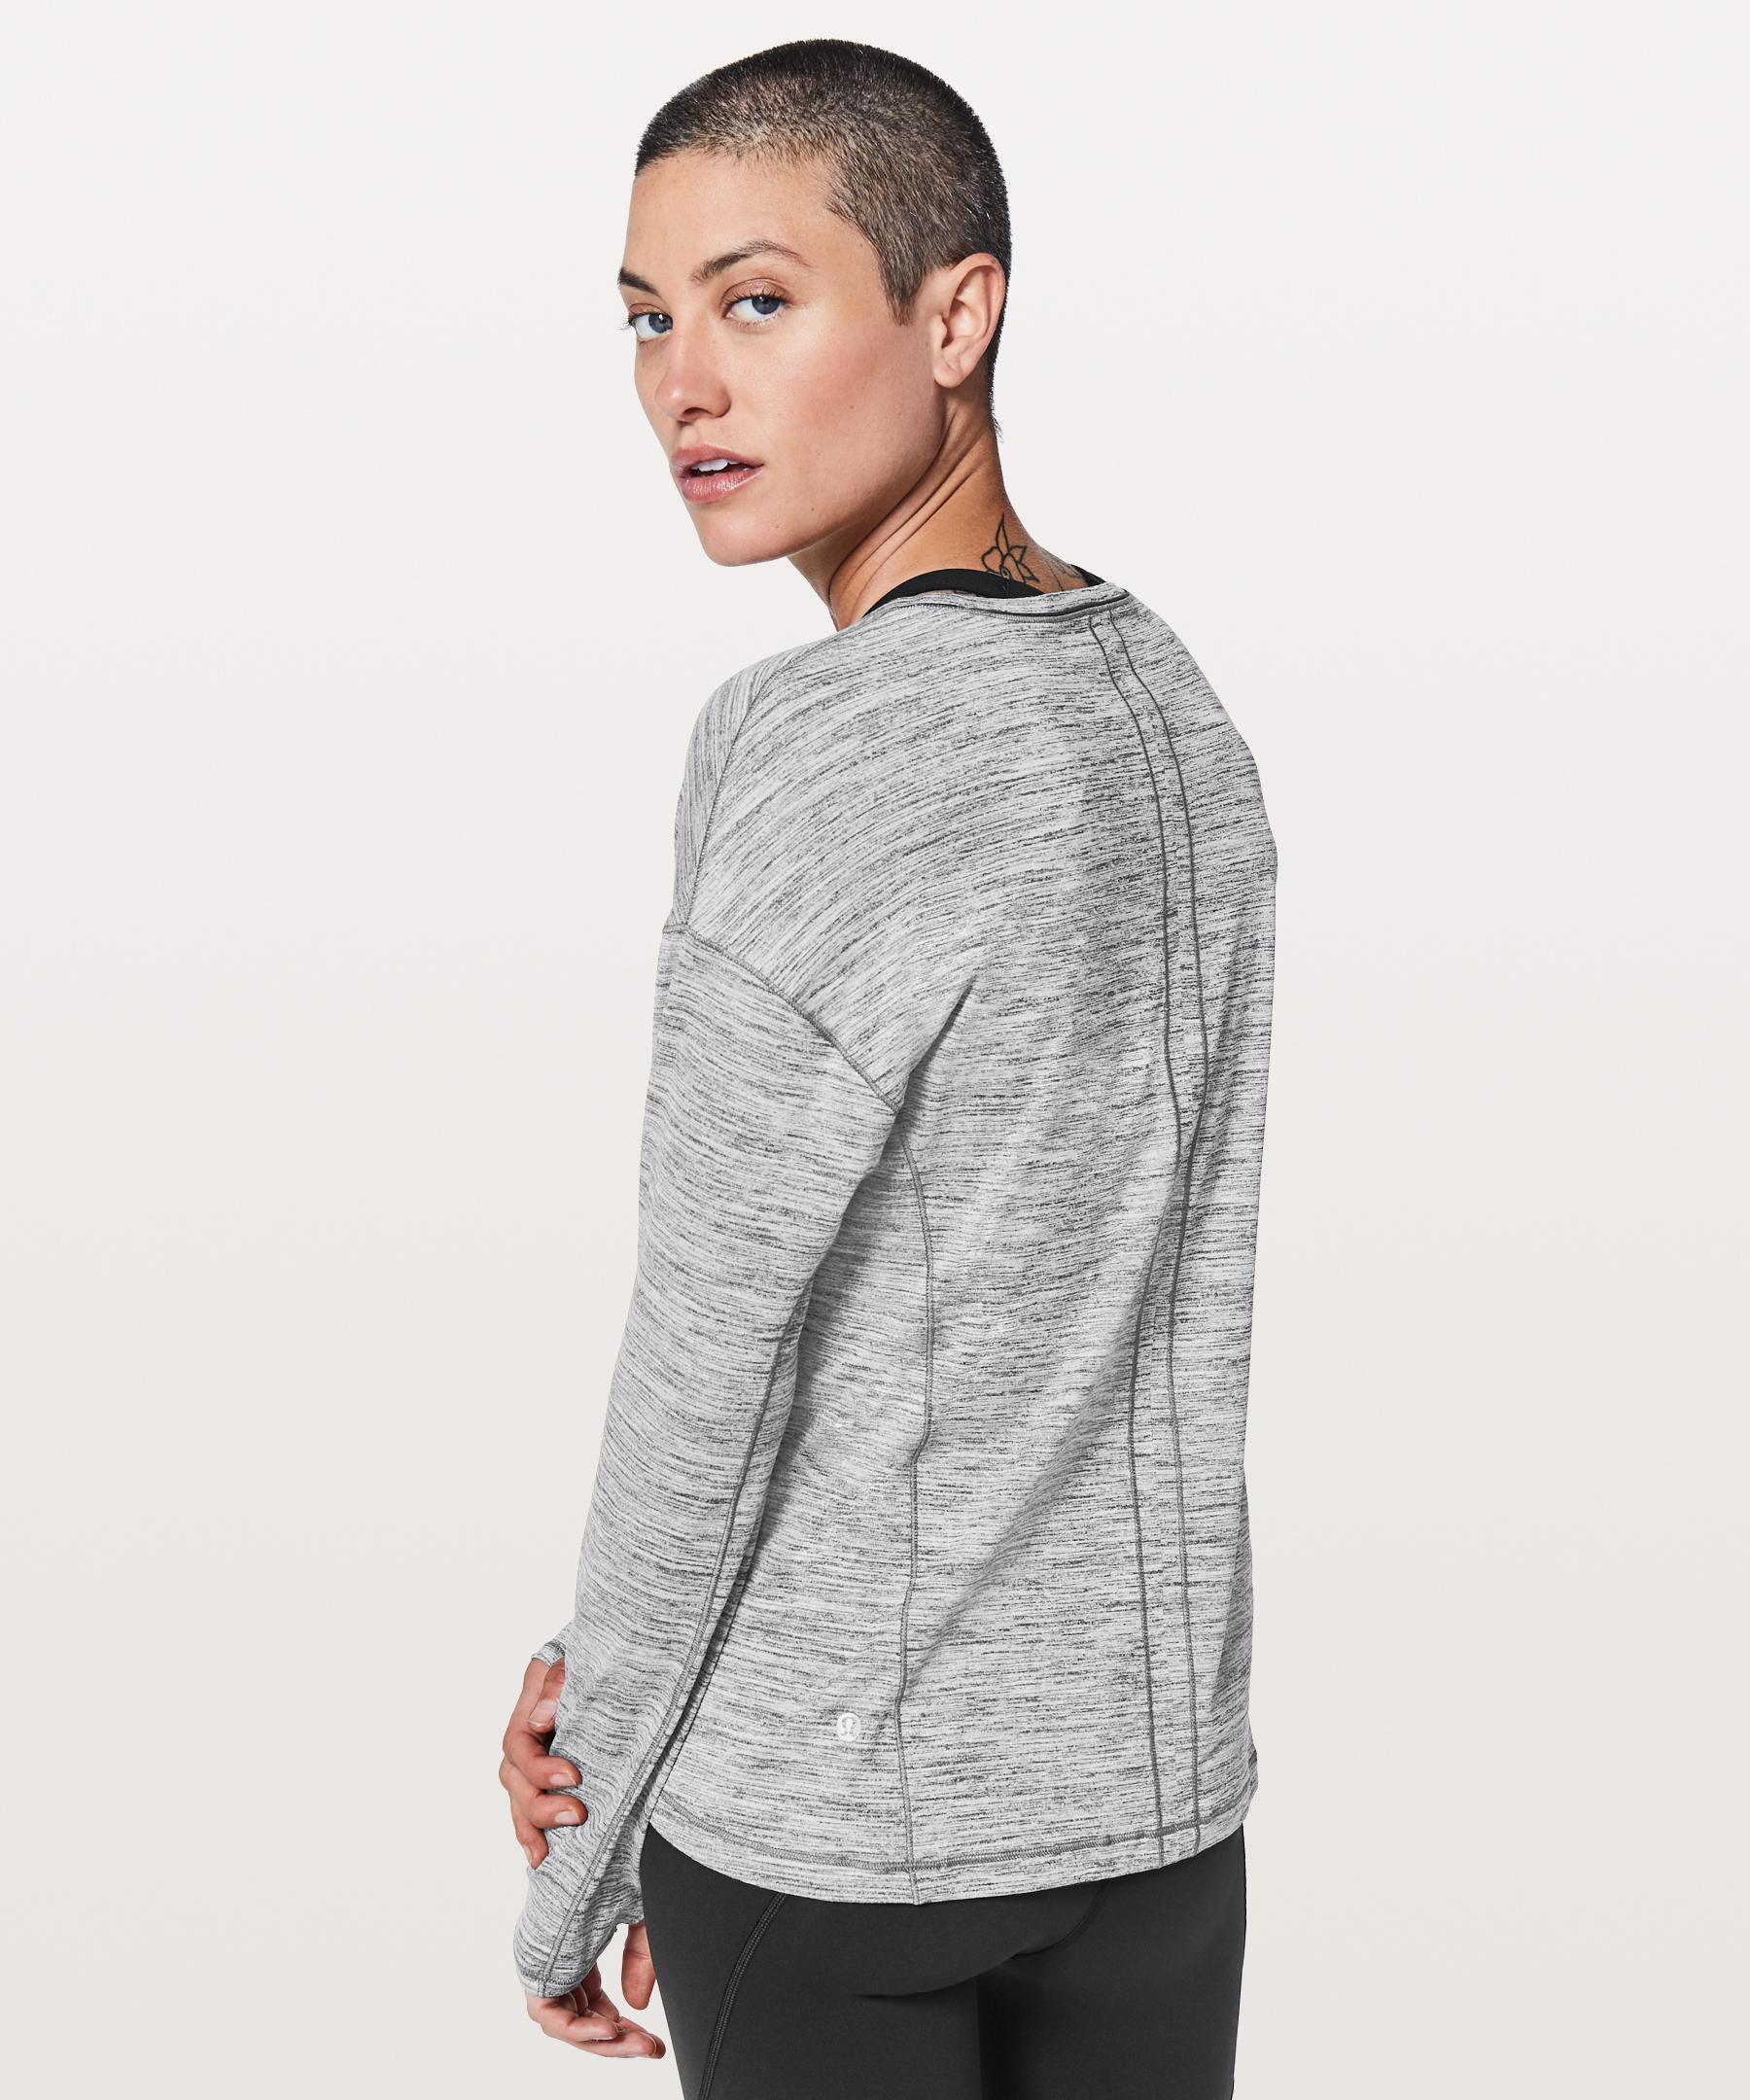 b61e55217a lululemon athletica Sweat Embrace Long Sleeve in Gray - Lyst